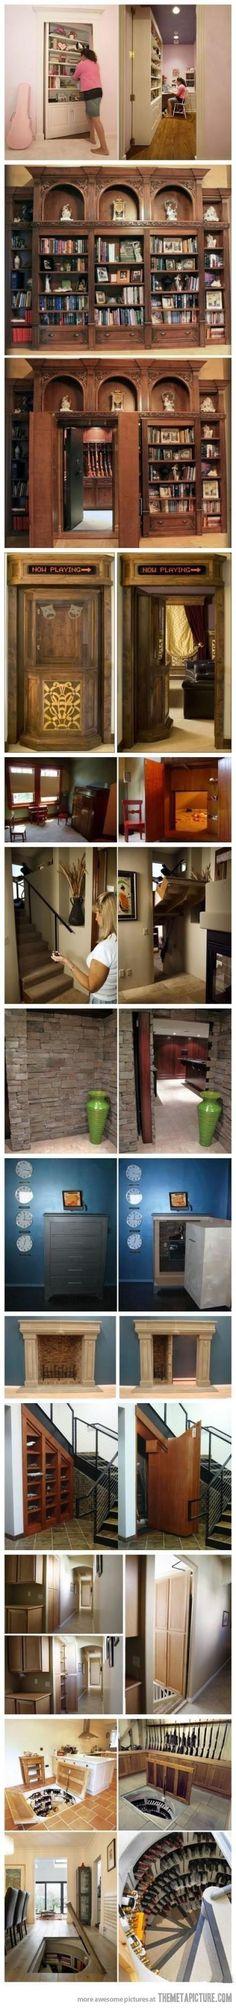 Houses with secret doors…